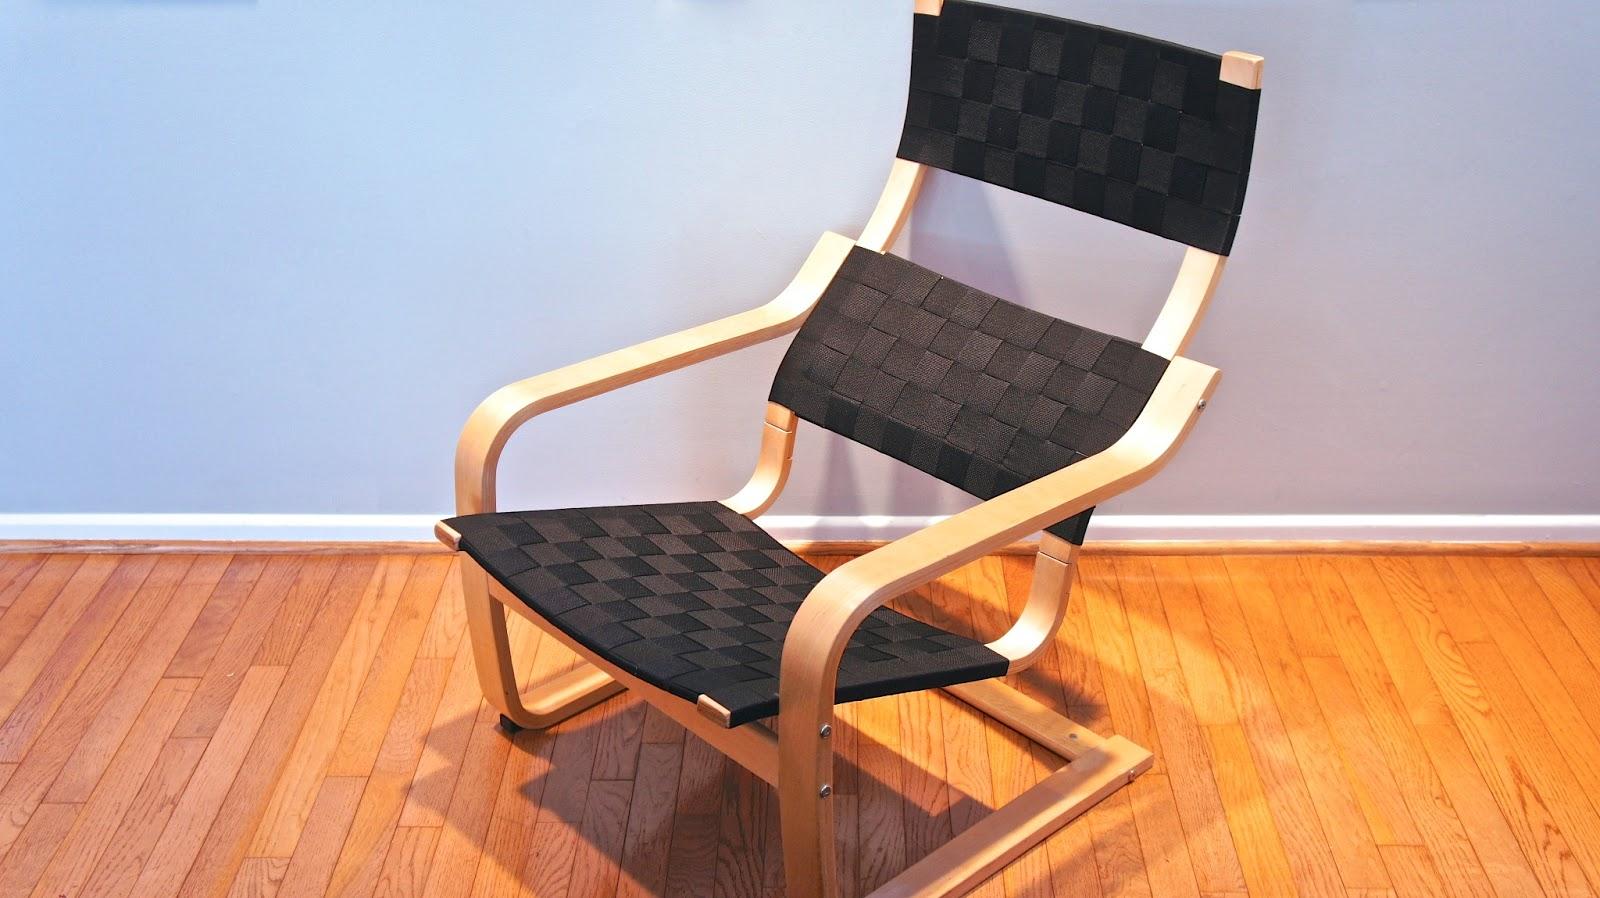 Food Fashion Home Poang Chair Rejuvination